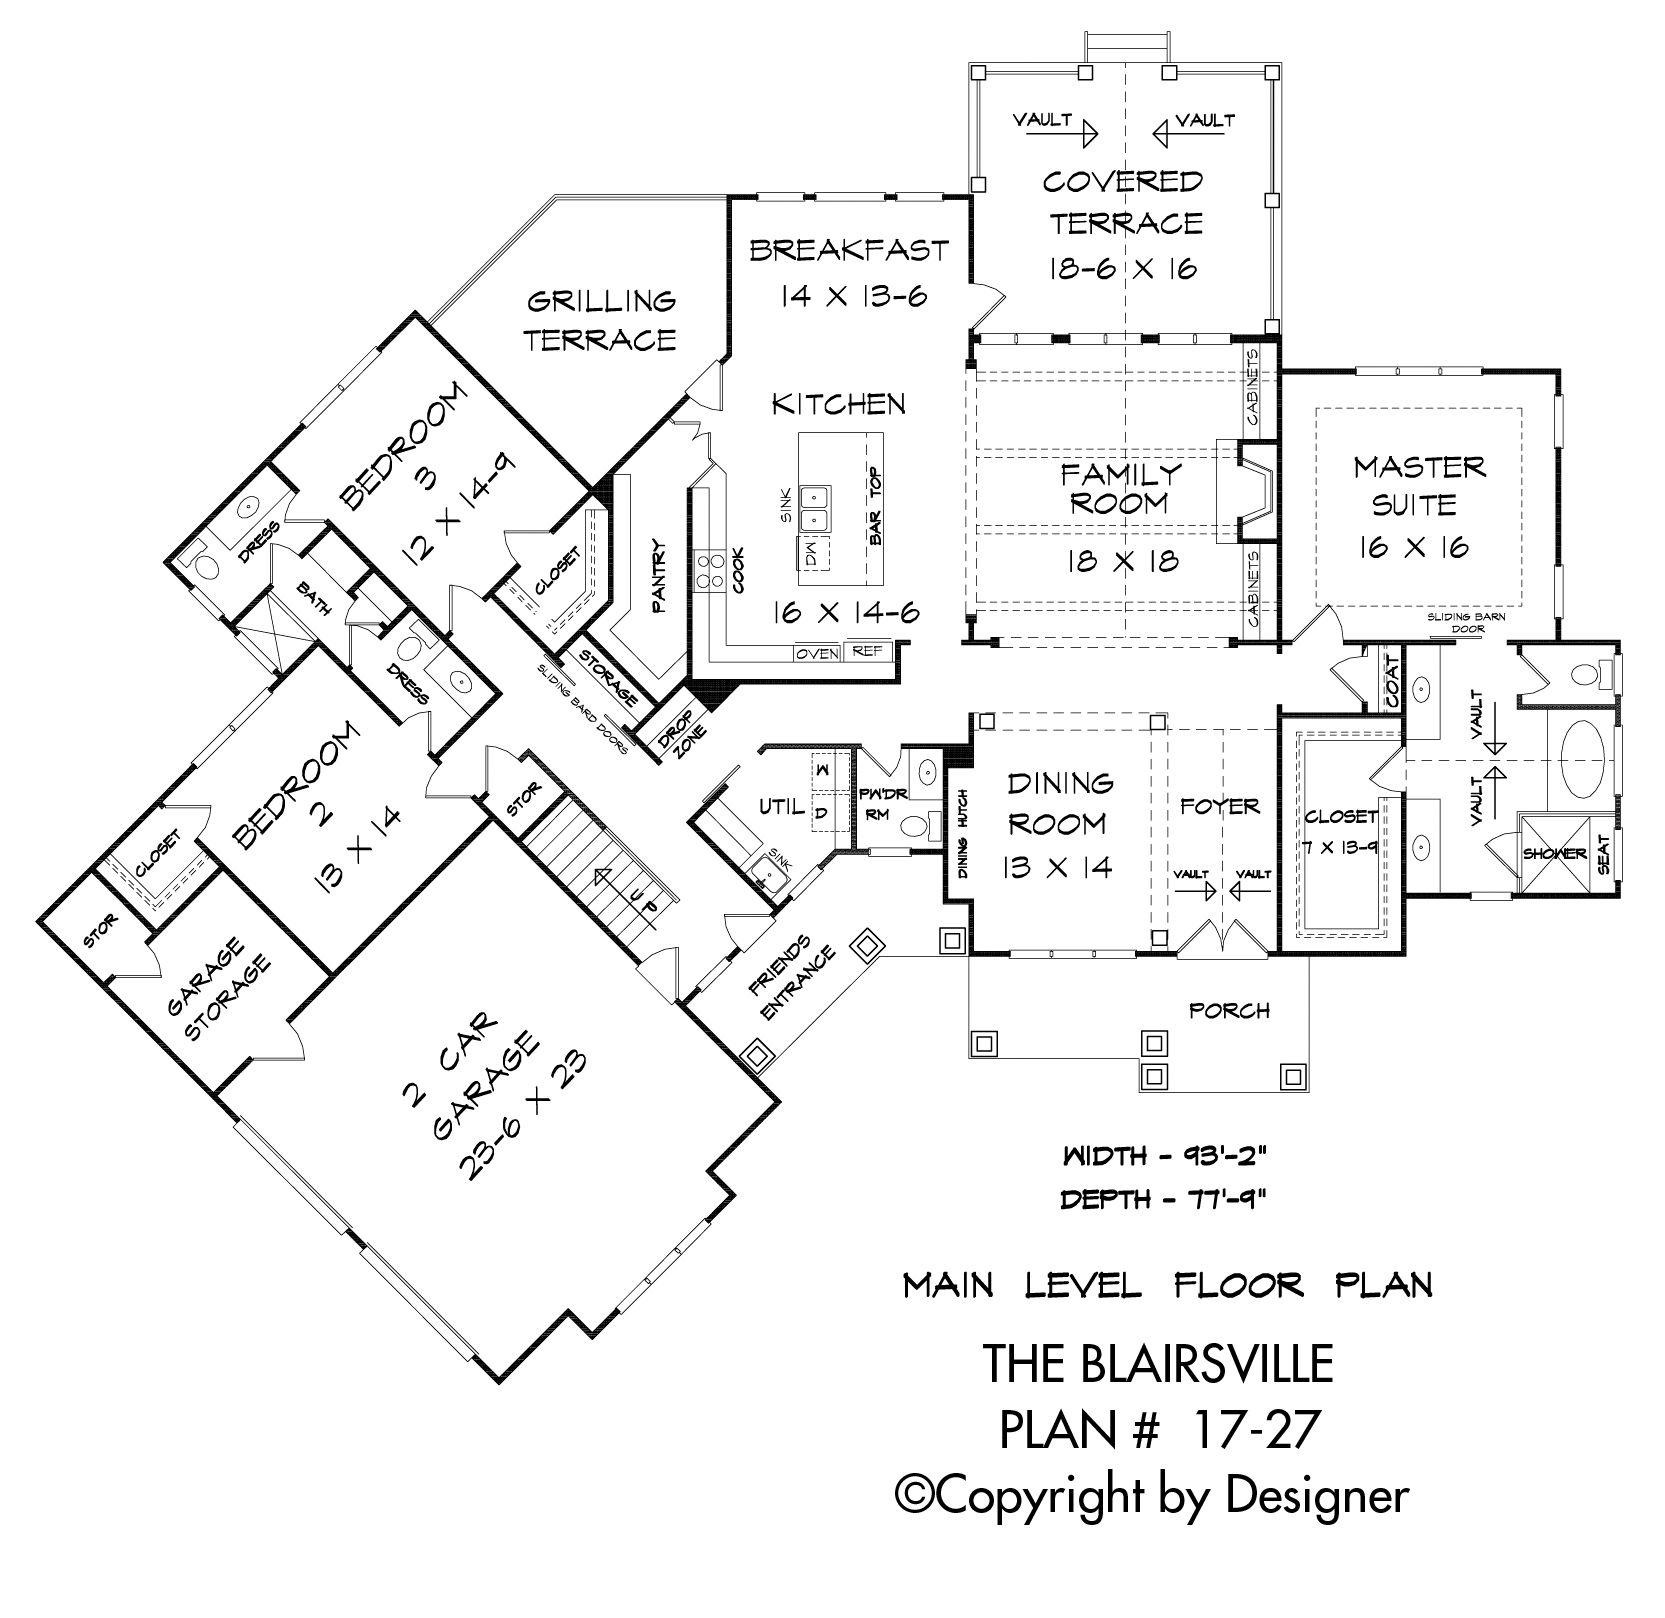 Blairsville House Plan 17 27 Kt Garrell Associates Inc Craftsman House Plan How To Plan Floor Plans